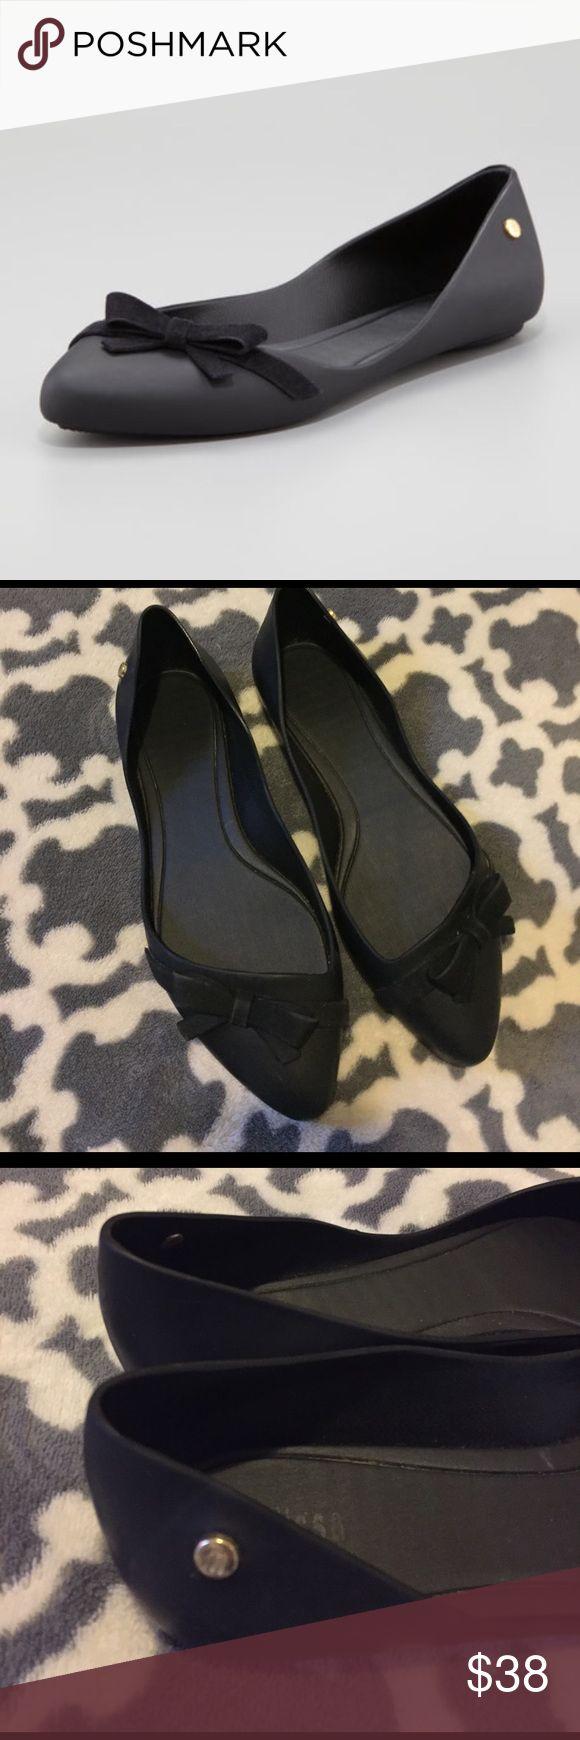 Melissa Trippy Bow Ballet Flats Euc worn twice Melissa Shoes Flats & Loafers